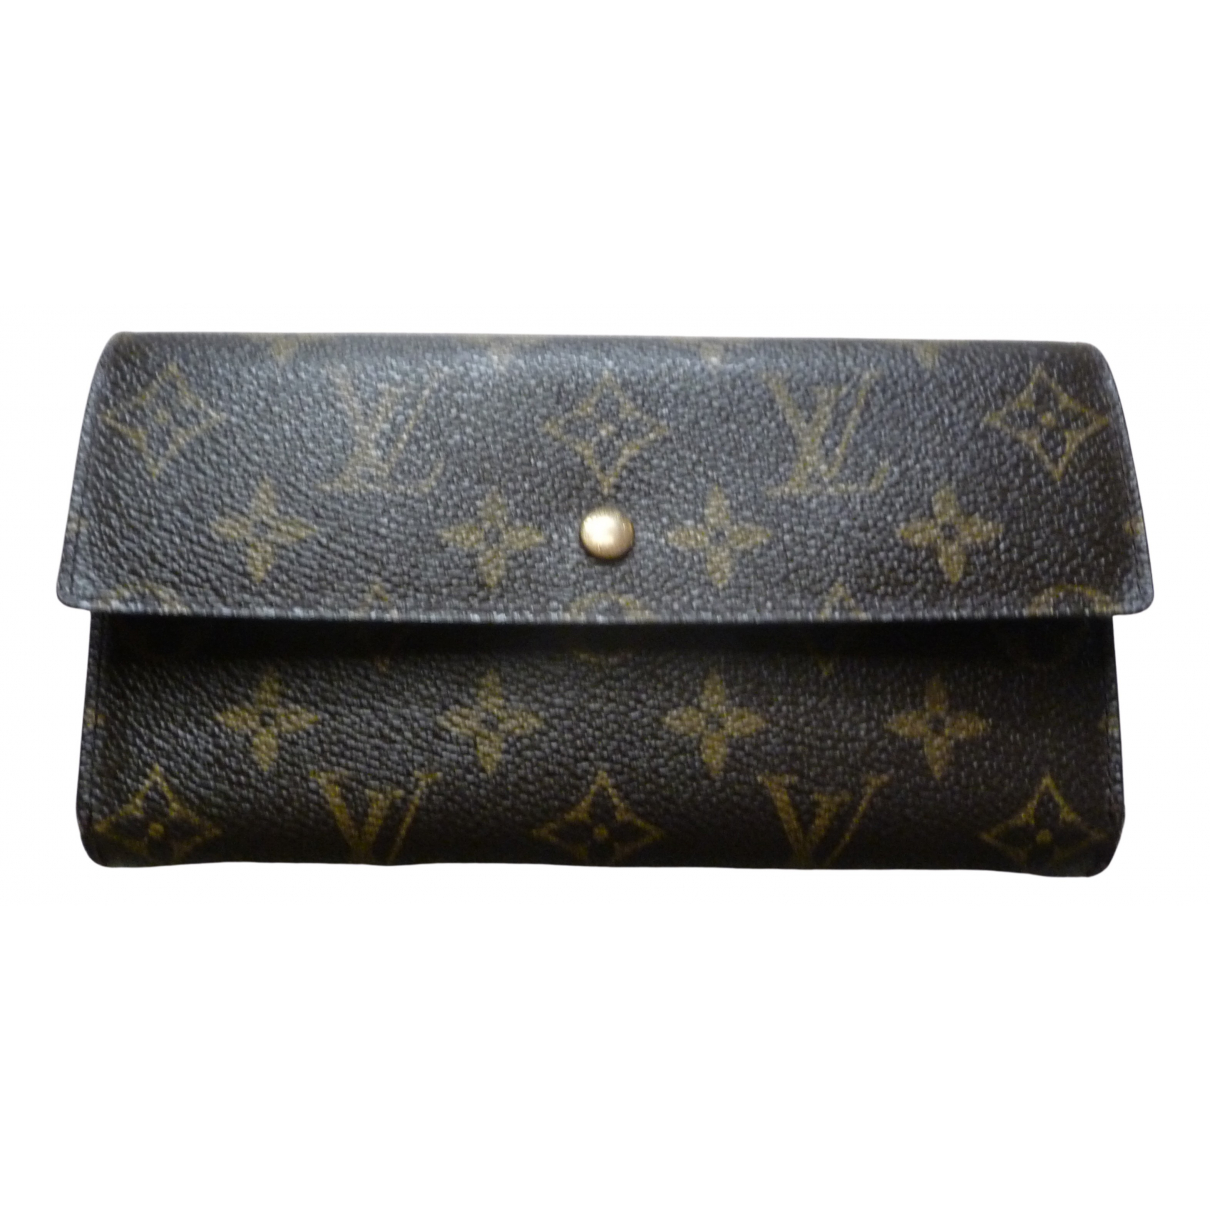 Billetero de Lona Louis Vuitton